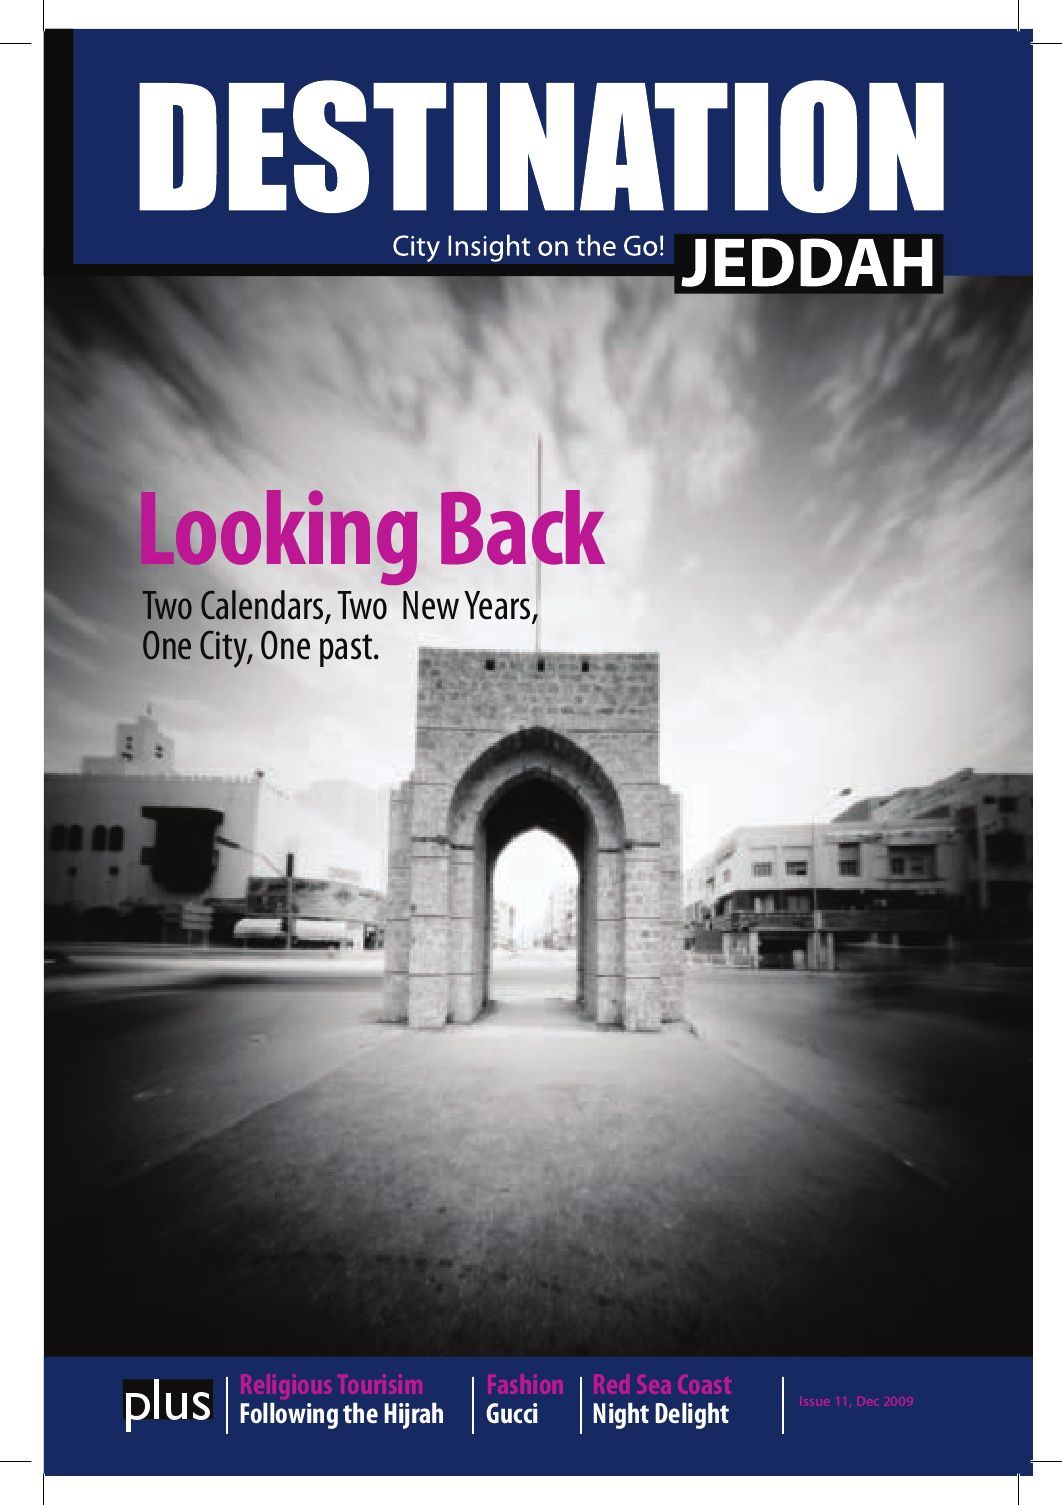 Destination Jeddah December Issue by Rumman